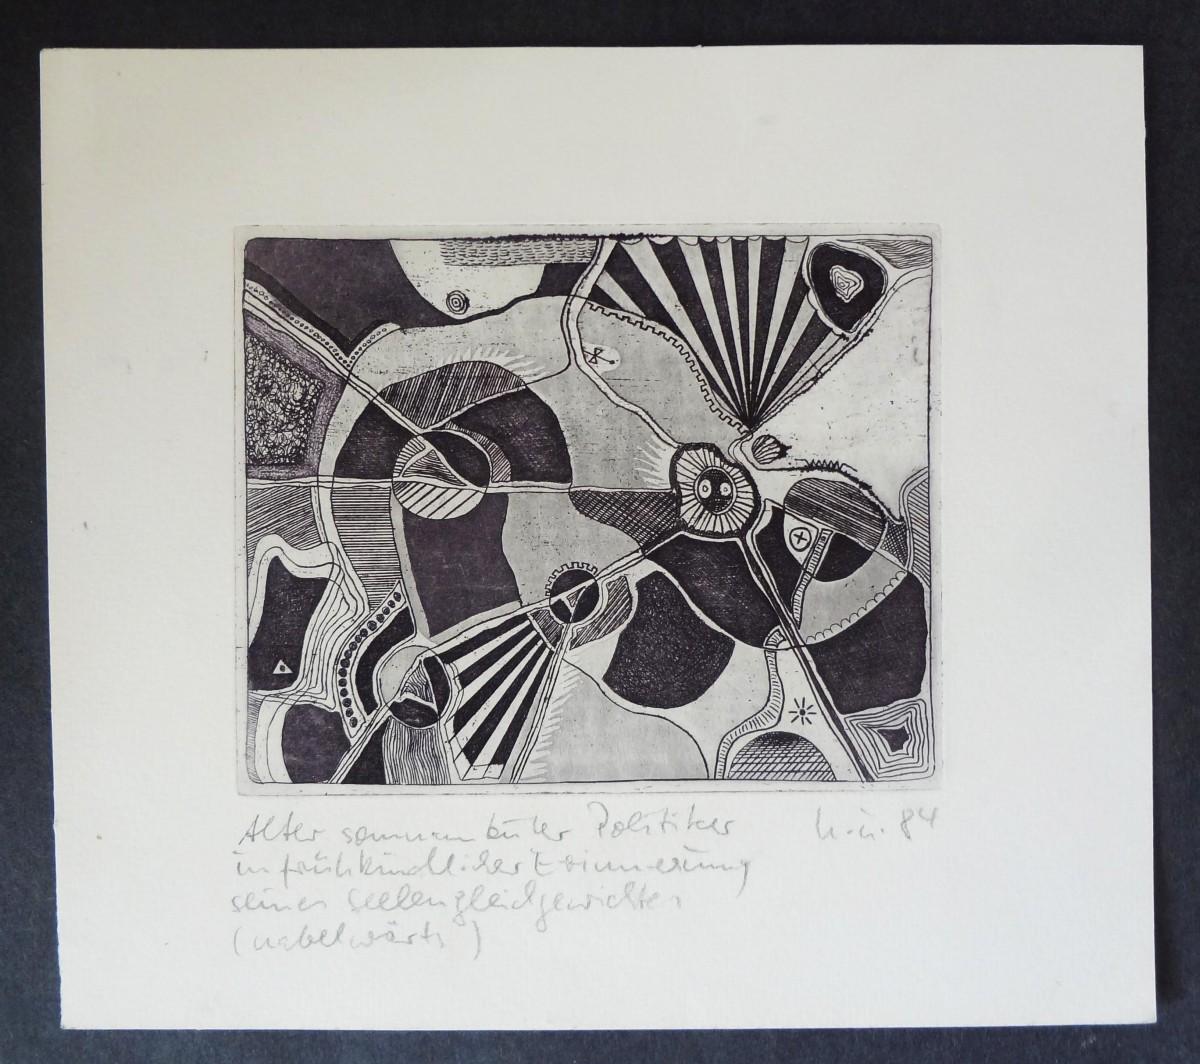 Heiner Ulrich - Handsignieerte Aquatinta Radierung, Leipzig 1984 kopen? Bied vanaf 79!